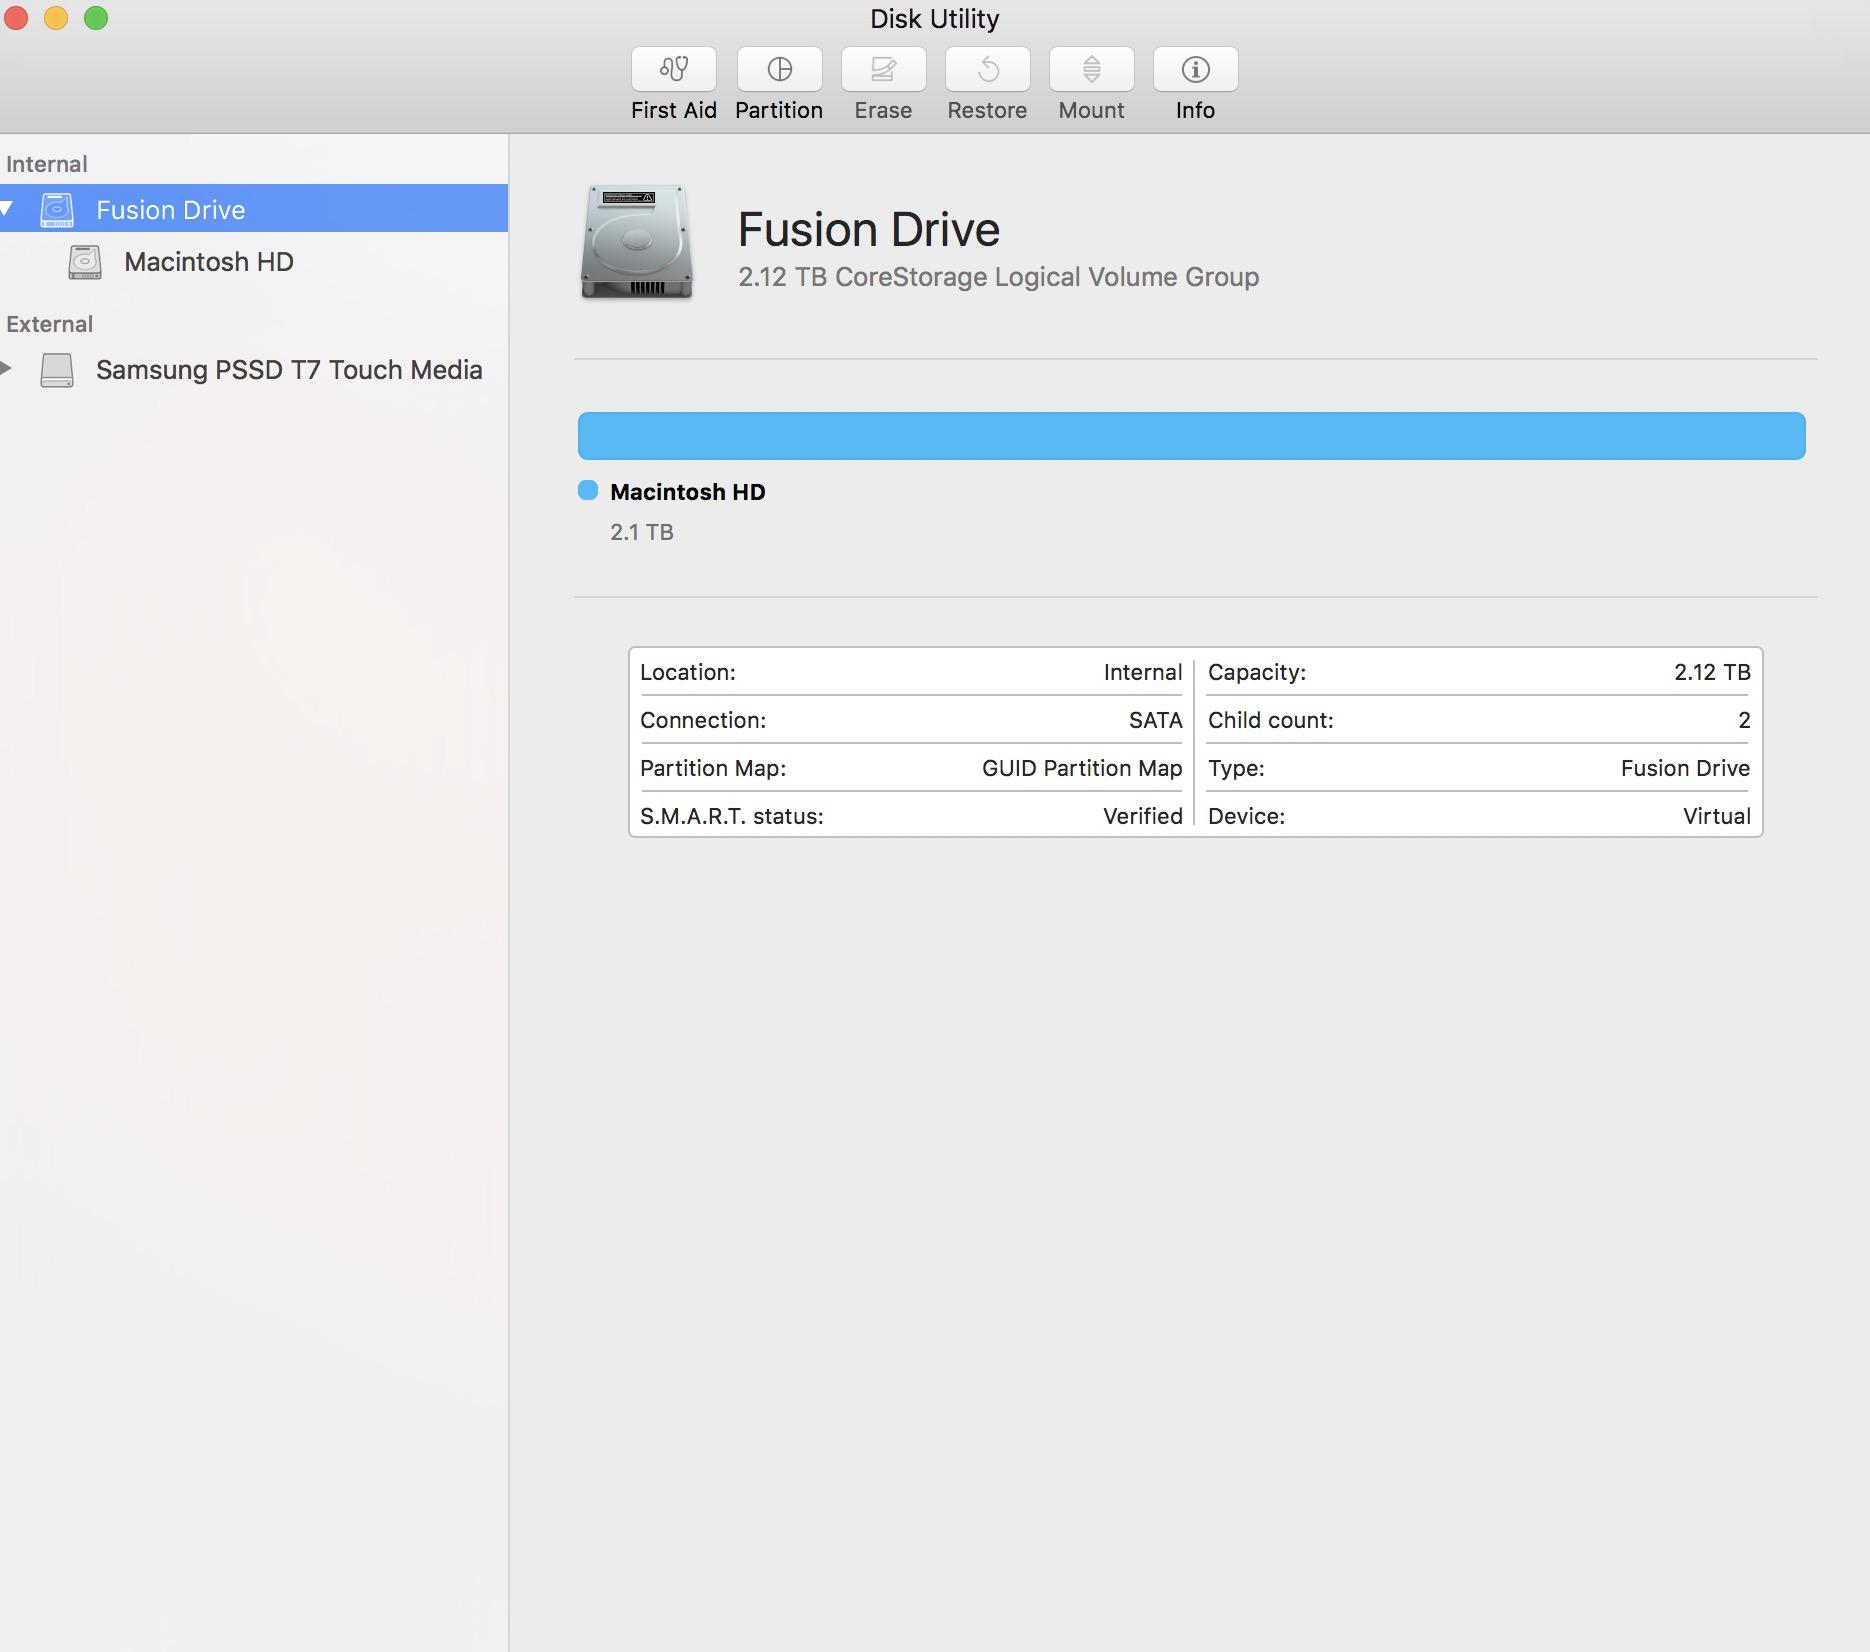 Screen Shot 2020-09-10 at 18.01.36.jpg